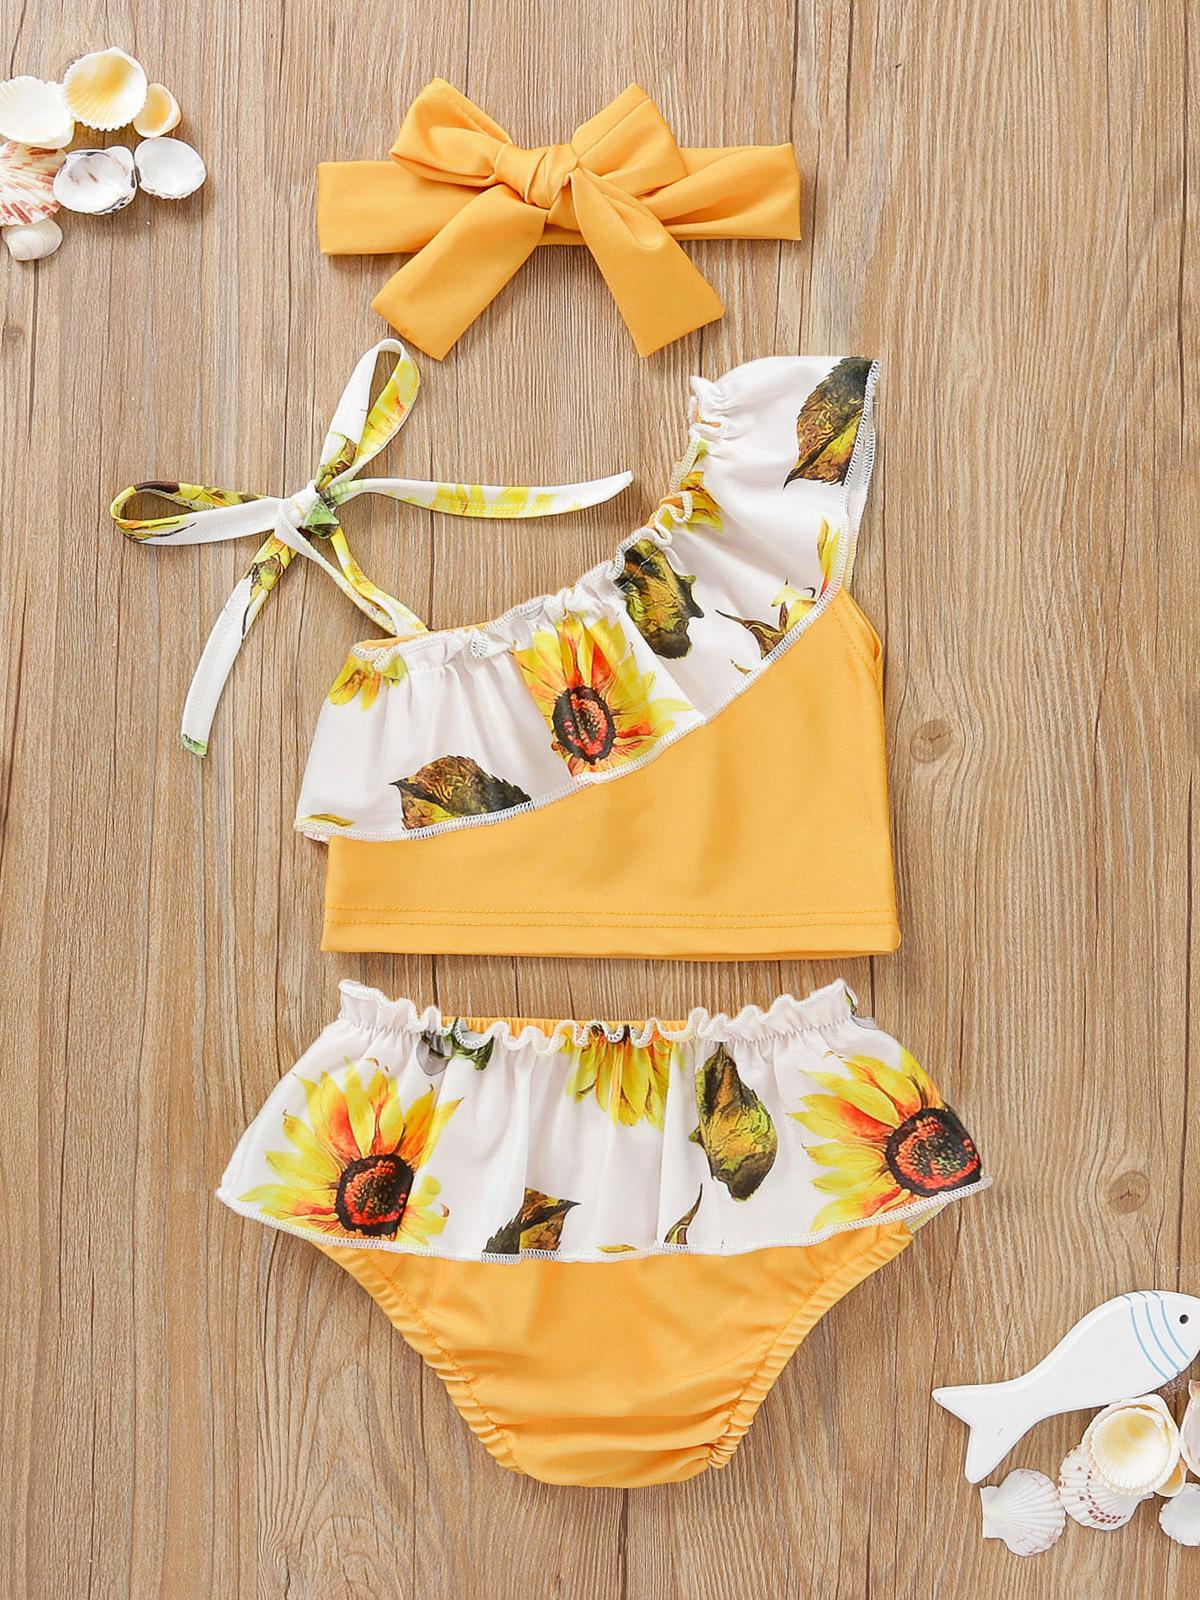 Adorable Sunflower Print Tie-Wrap 2 Piece Swimsuit